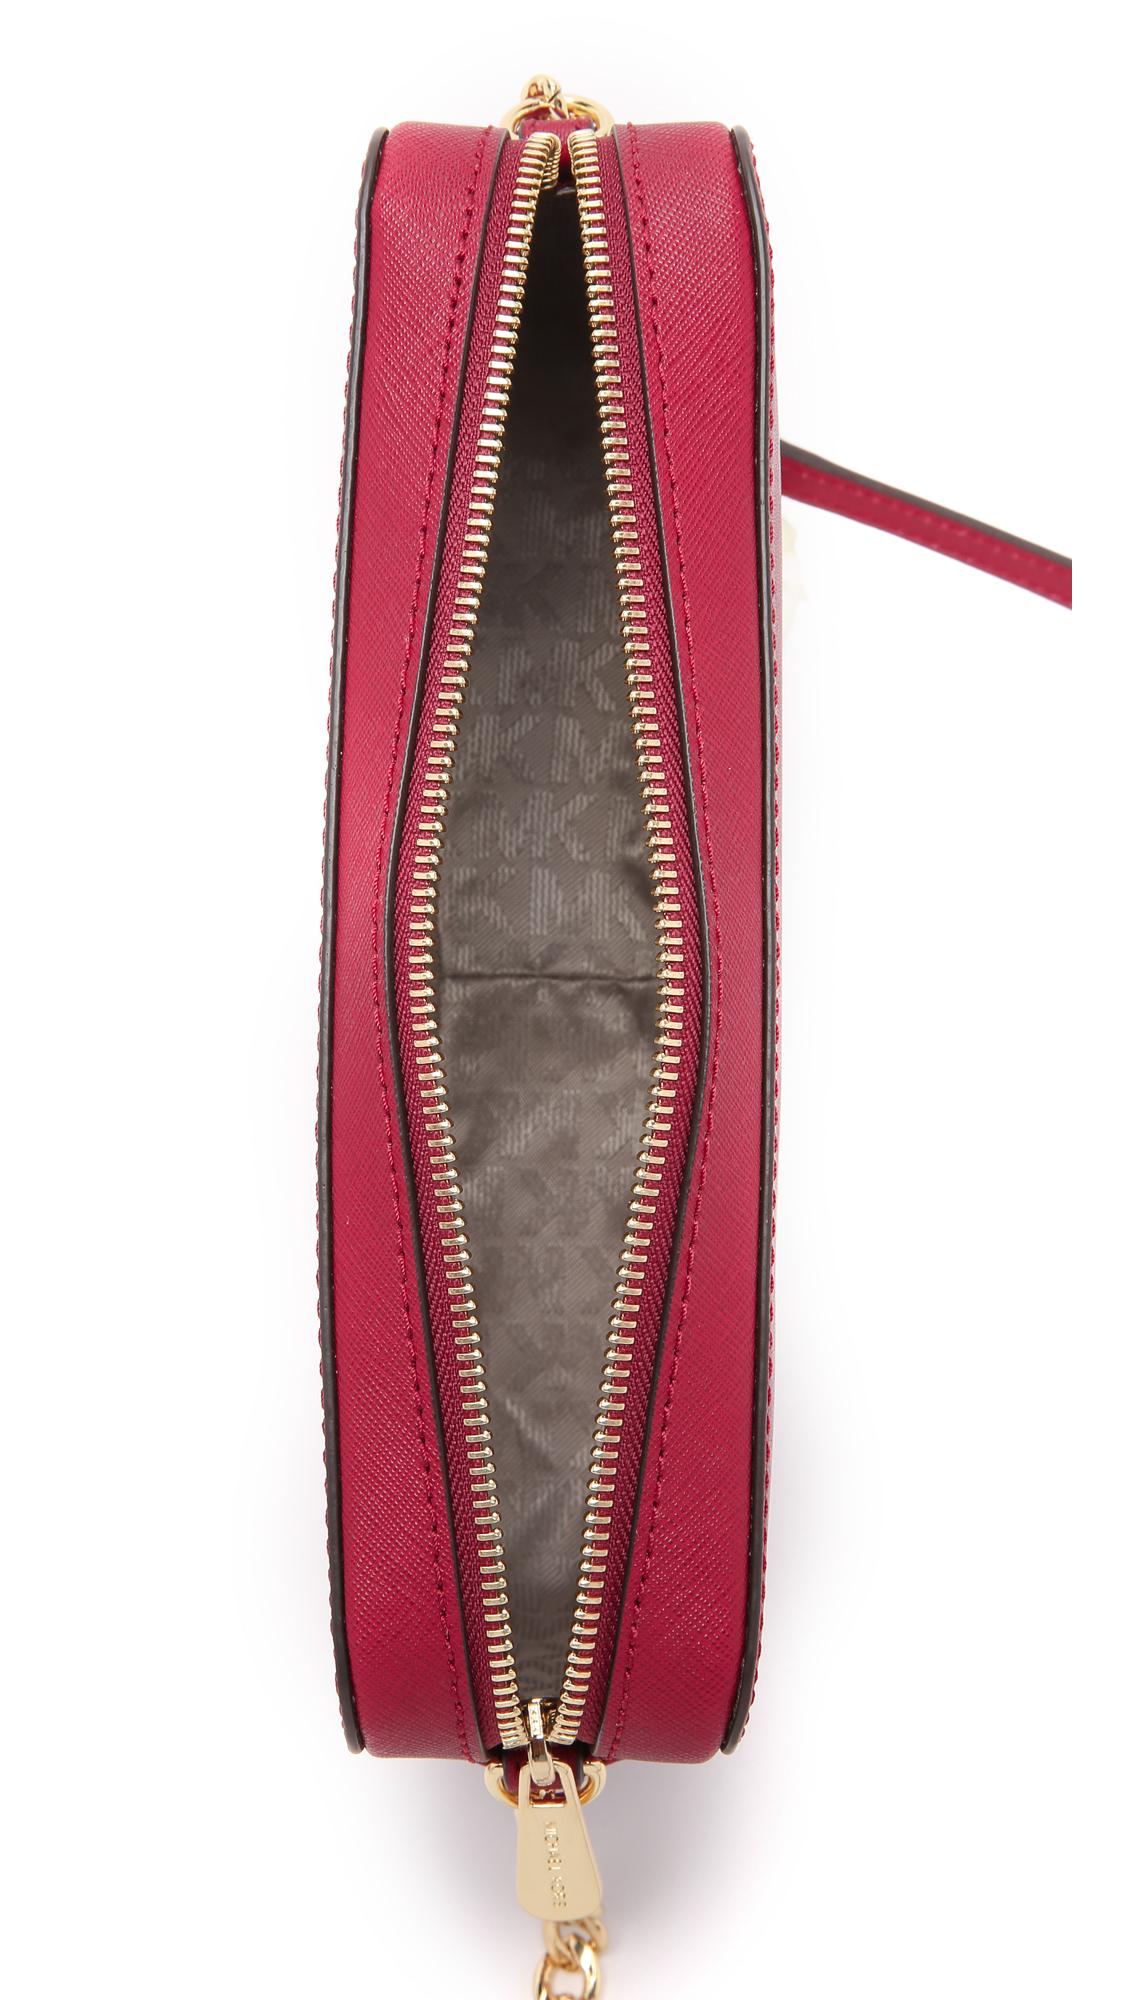 5ef17f2316431 Lyst - MICHAEL Michael Kors Jet Set Large Cross Body Bag - Ballet in Red